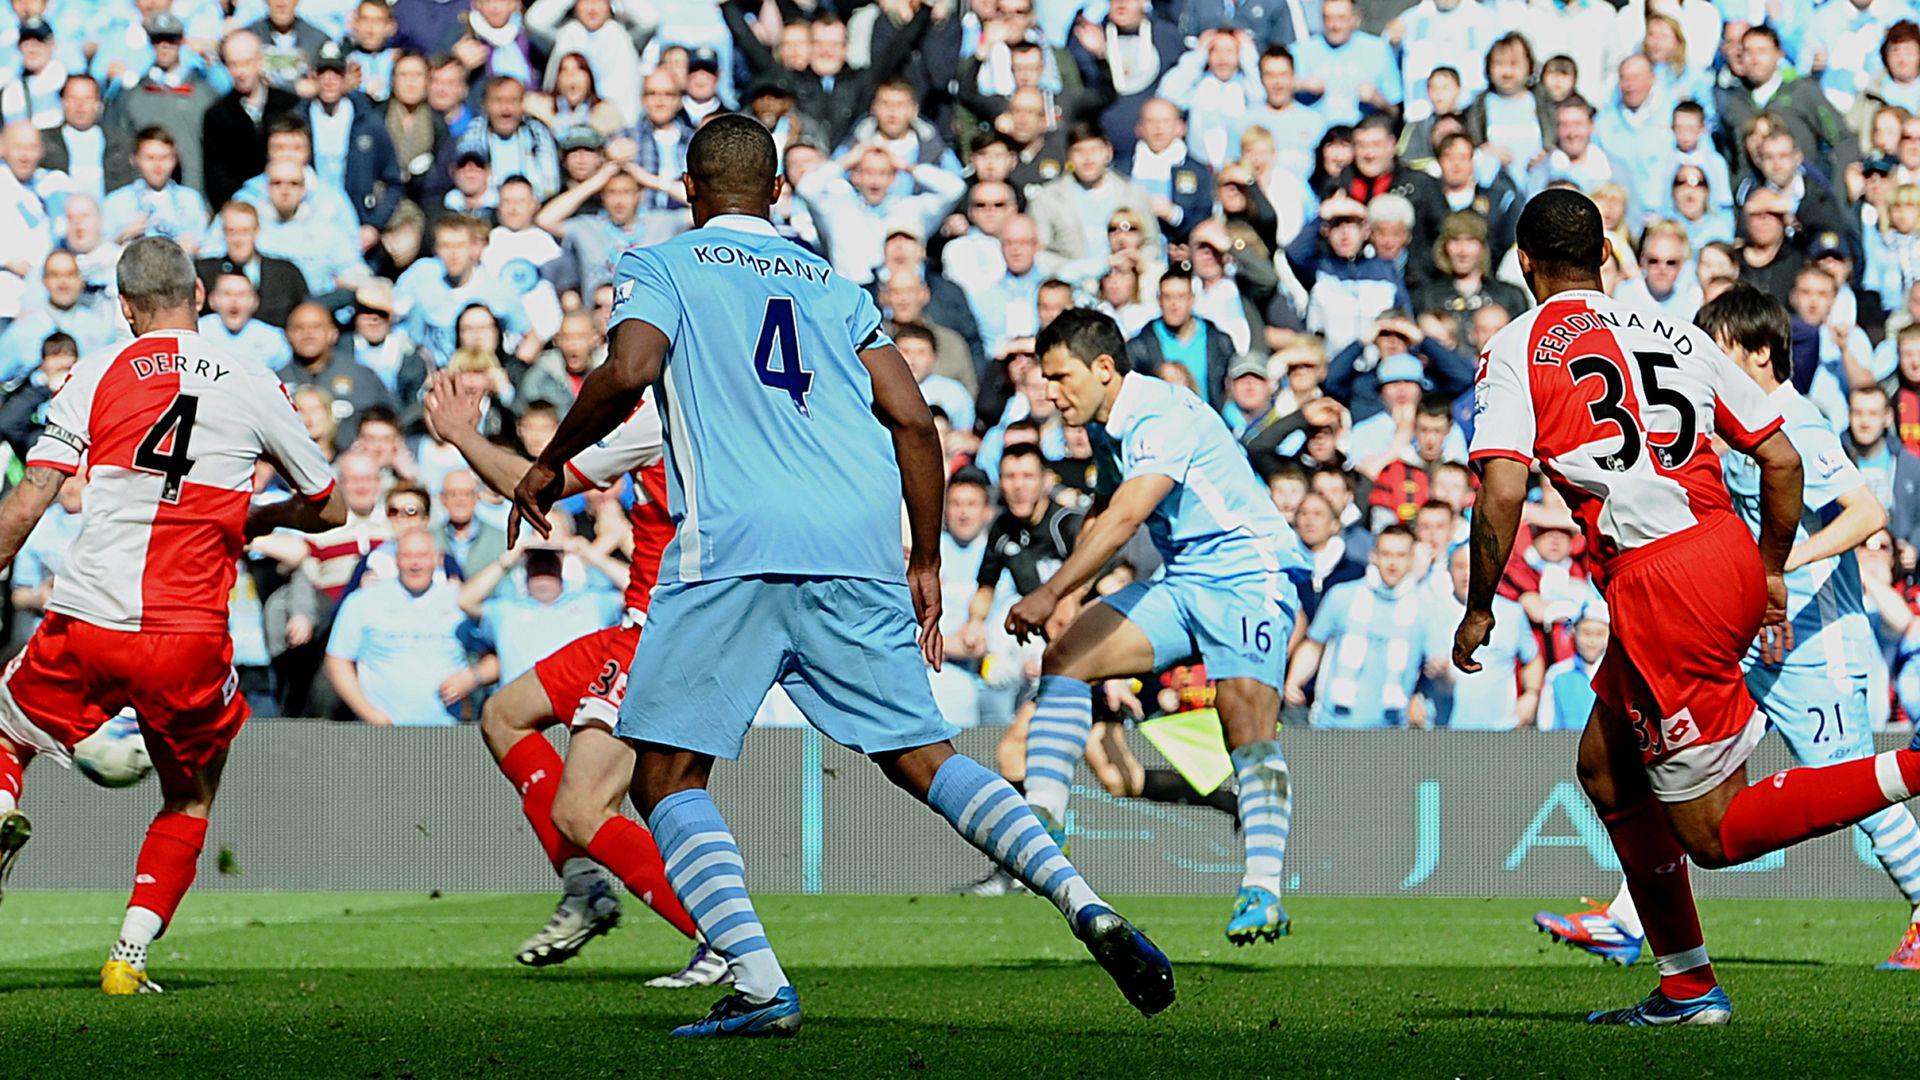 Best bits: Man City vs QPR '12 watchalong